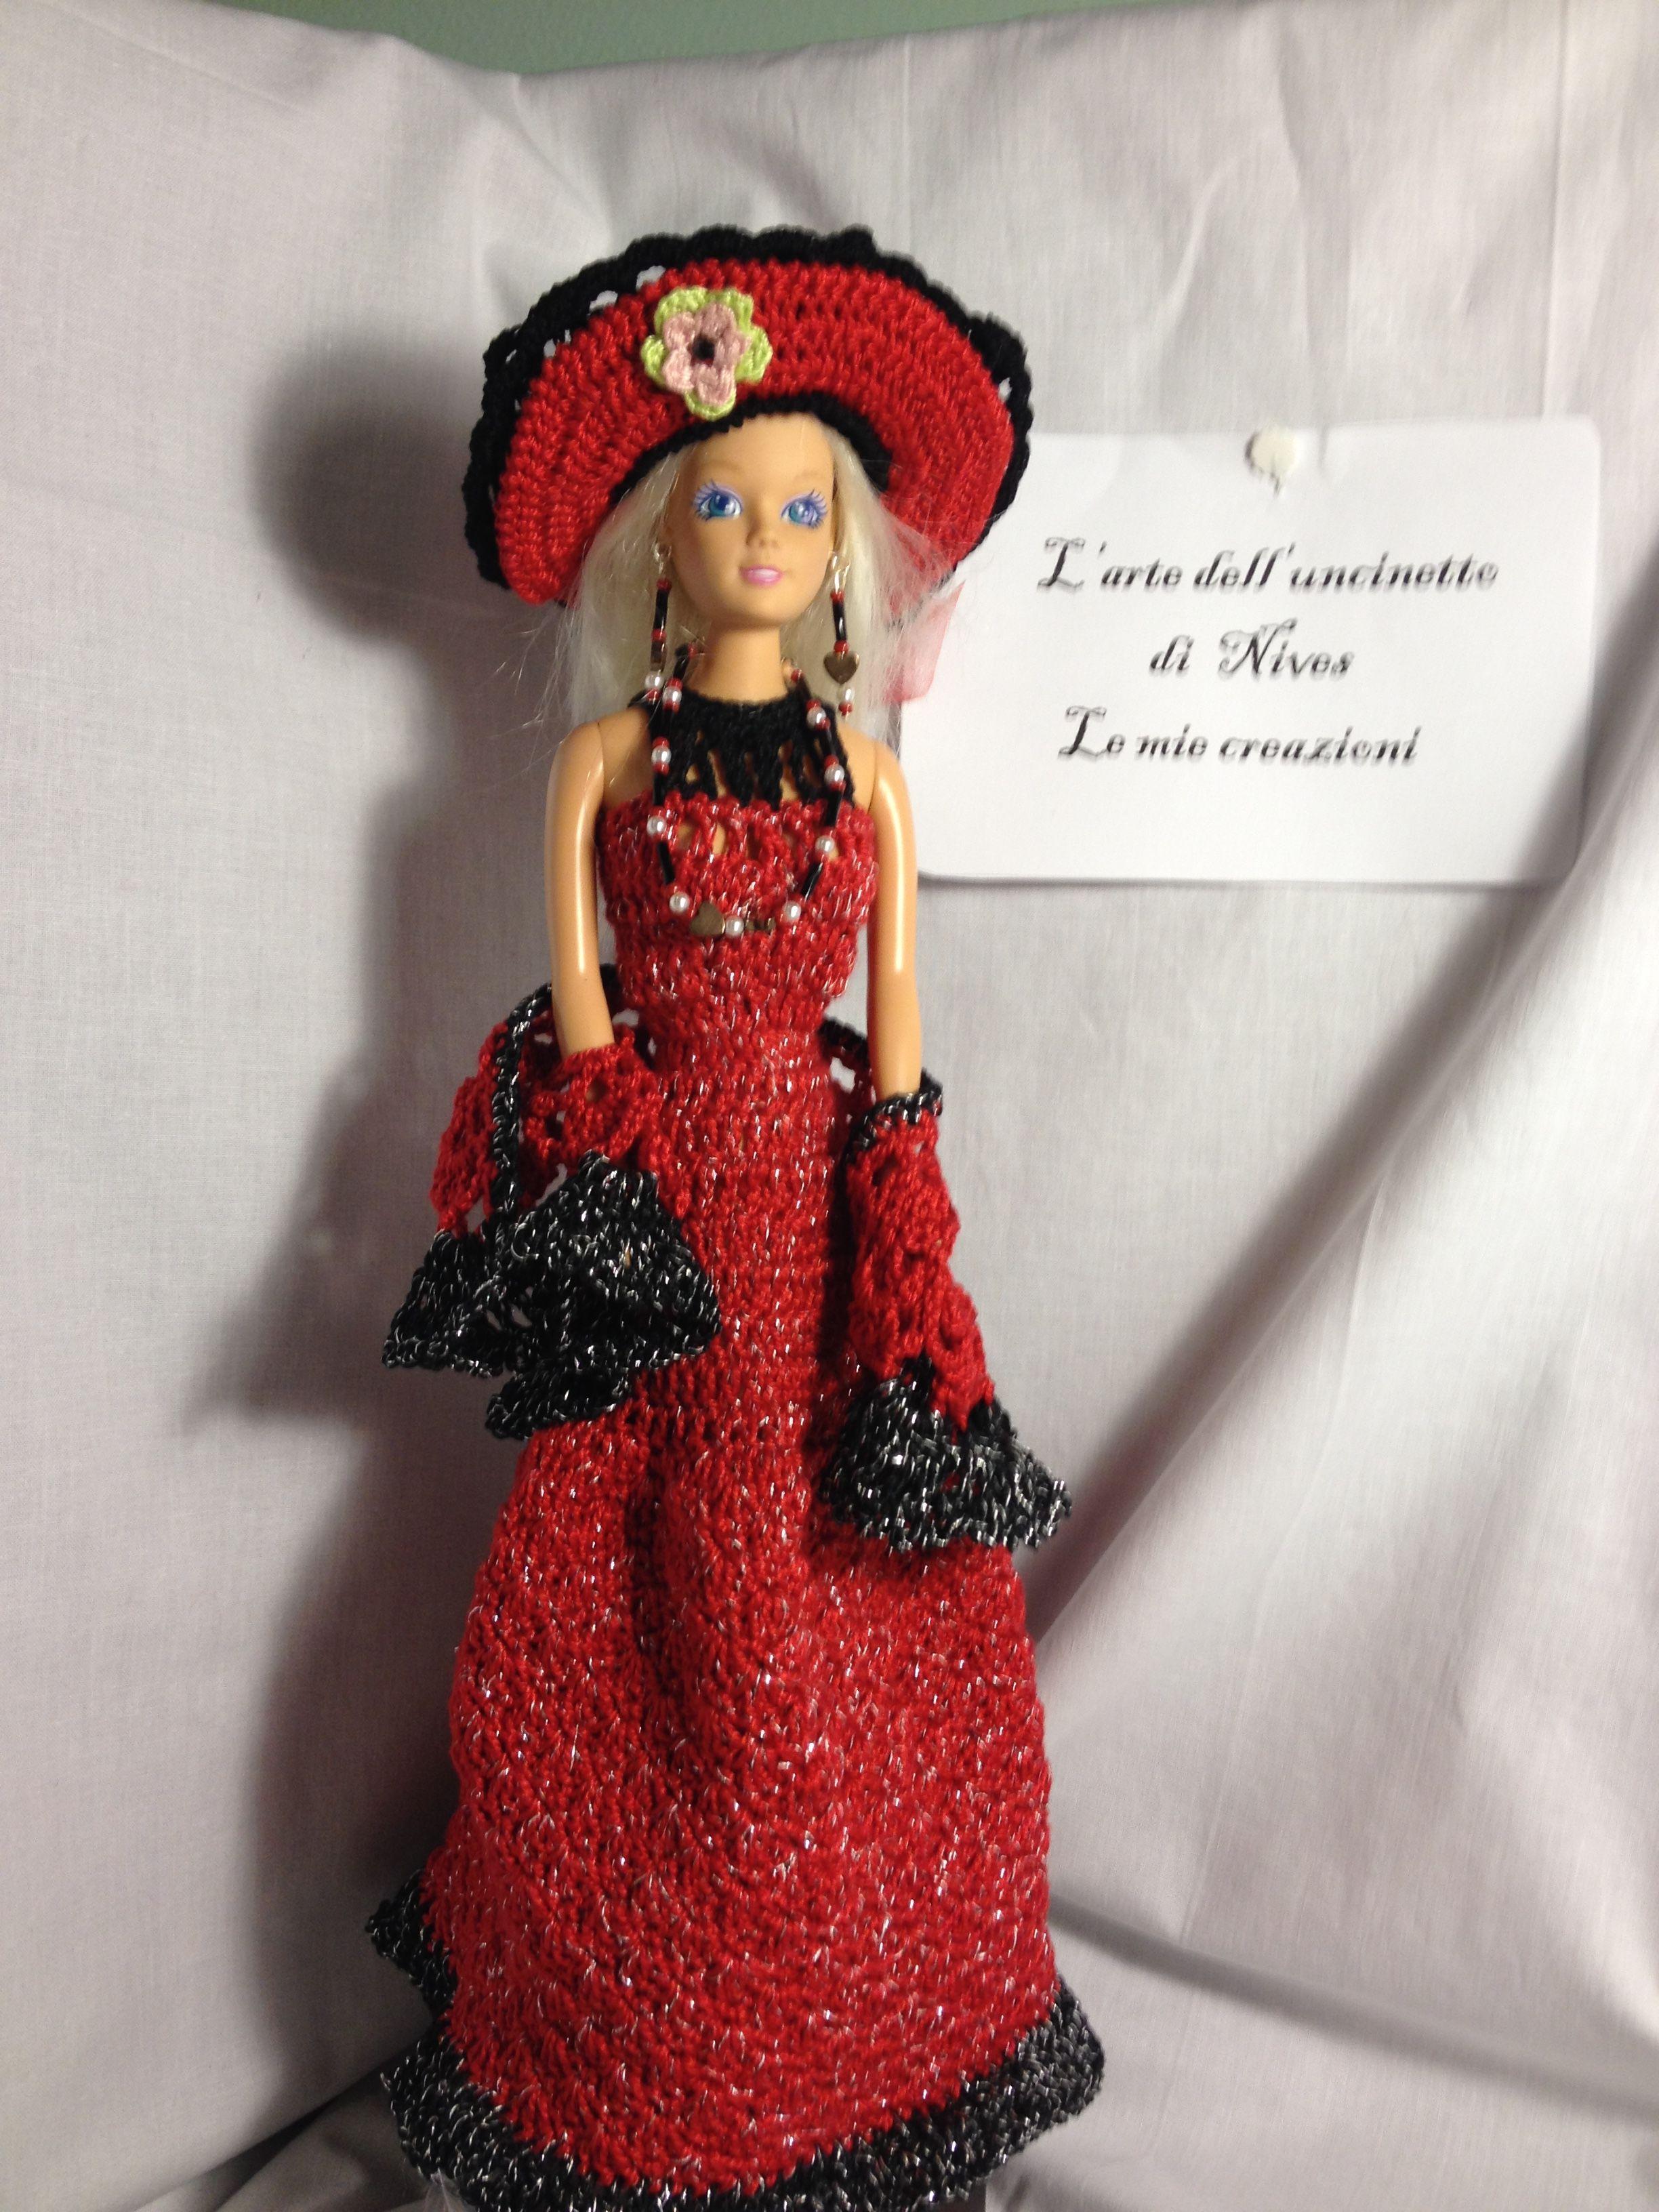 Dotted Delight ~ Dress Hat Parasol fits Barbie dolls crochet pattern leaflet